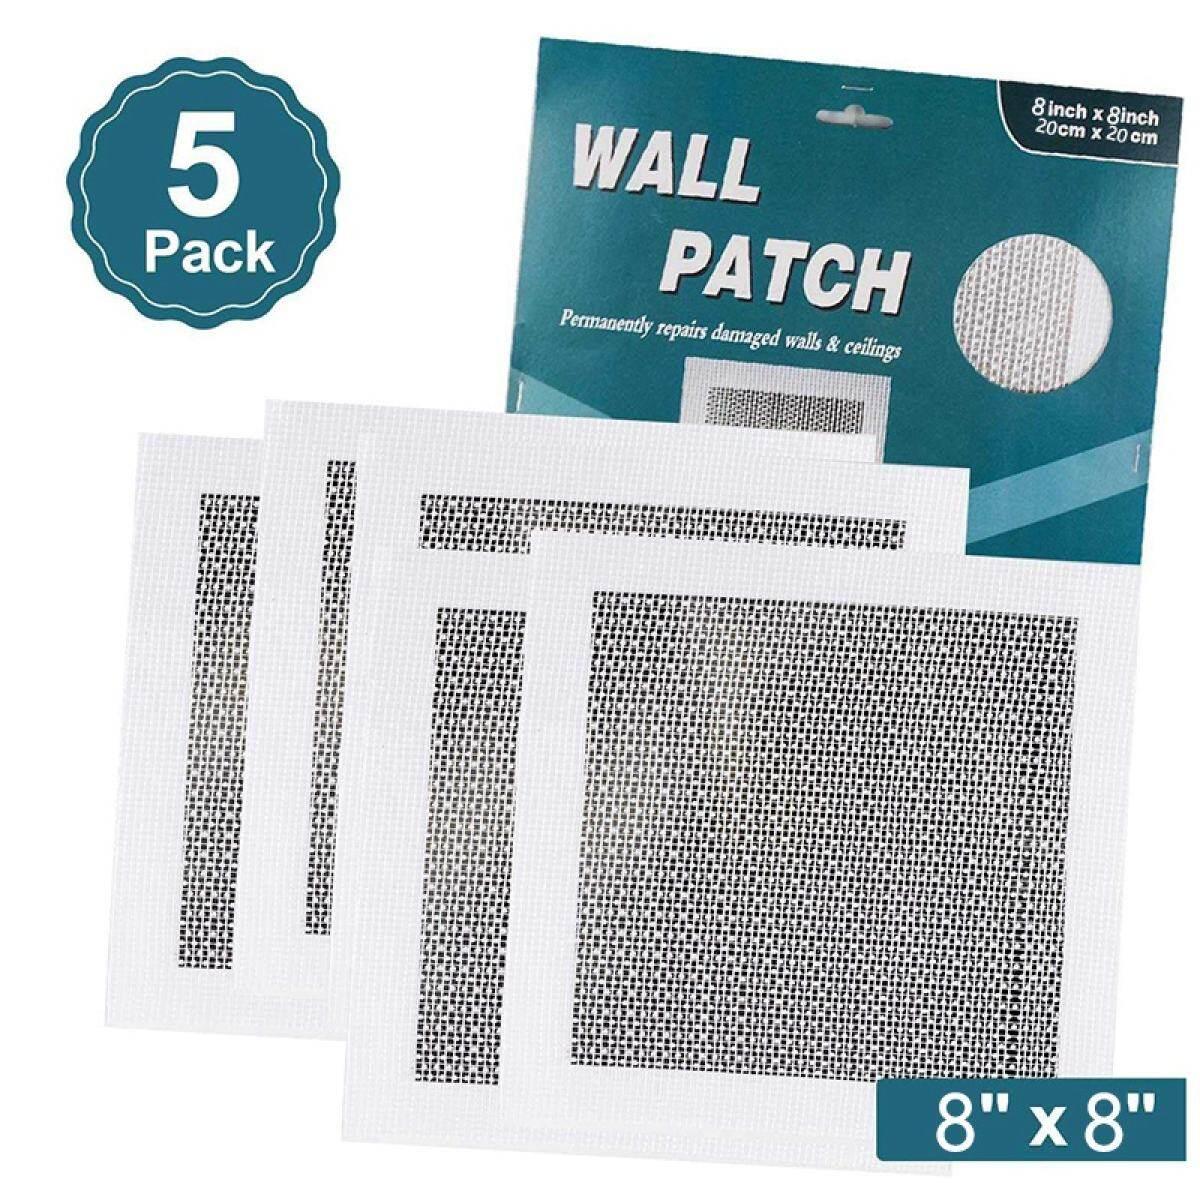 5 Pack Drywall Repair Patch Self Adhesive Wall Repair Patch Kit Heavy Duty Dry Wall Hole Repair Patch Lazada